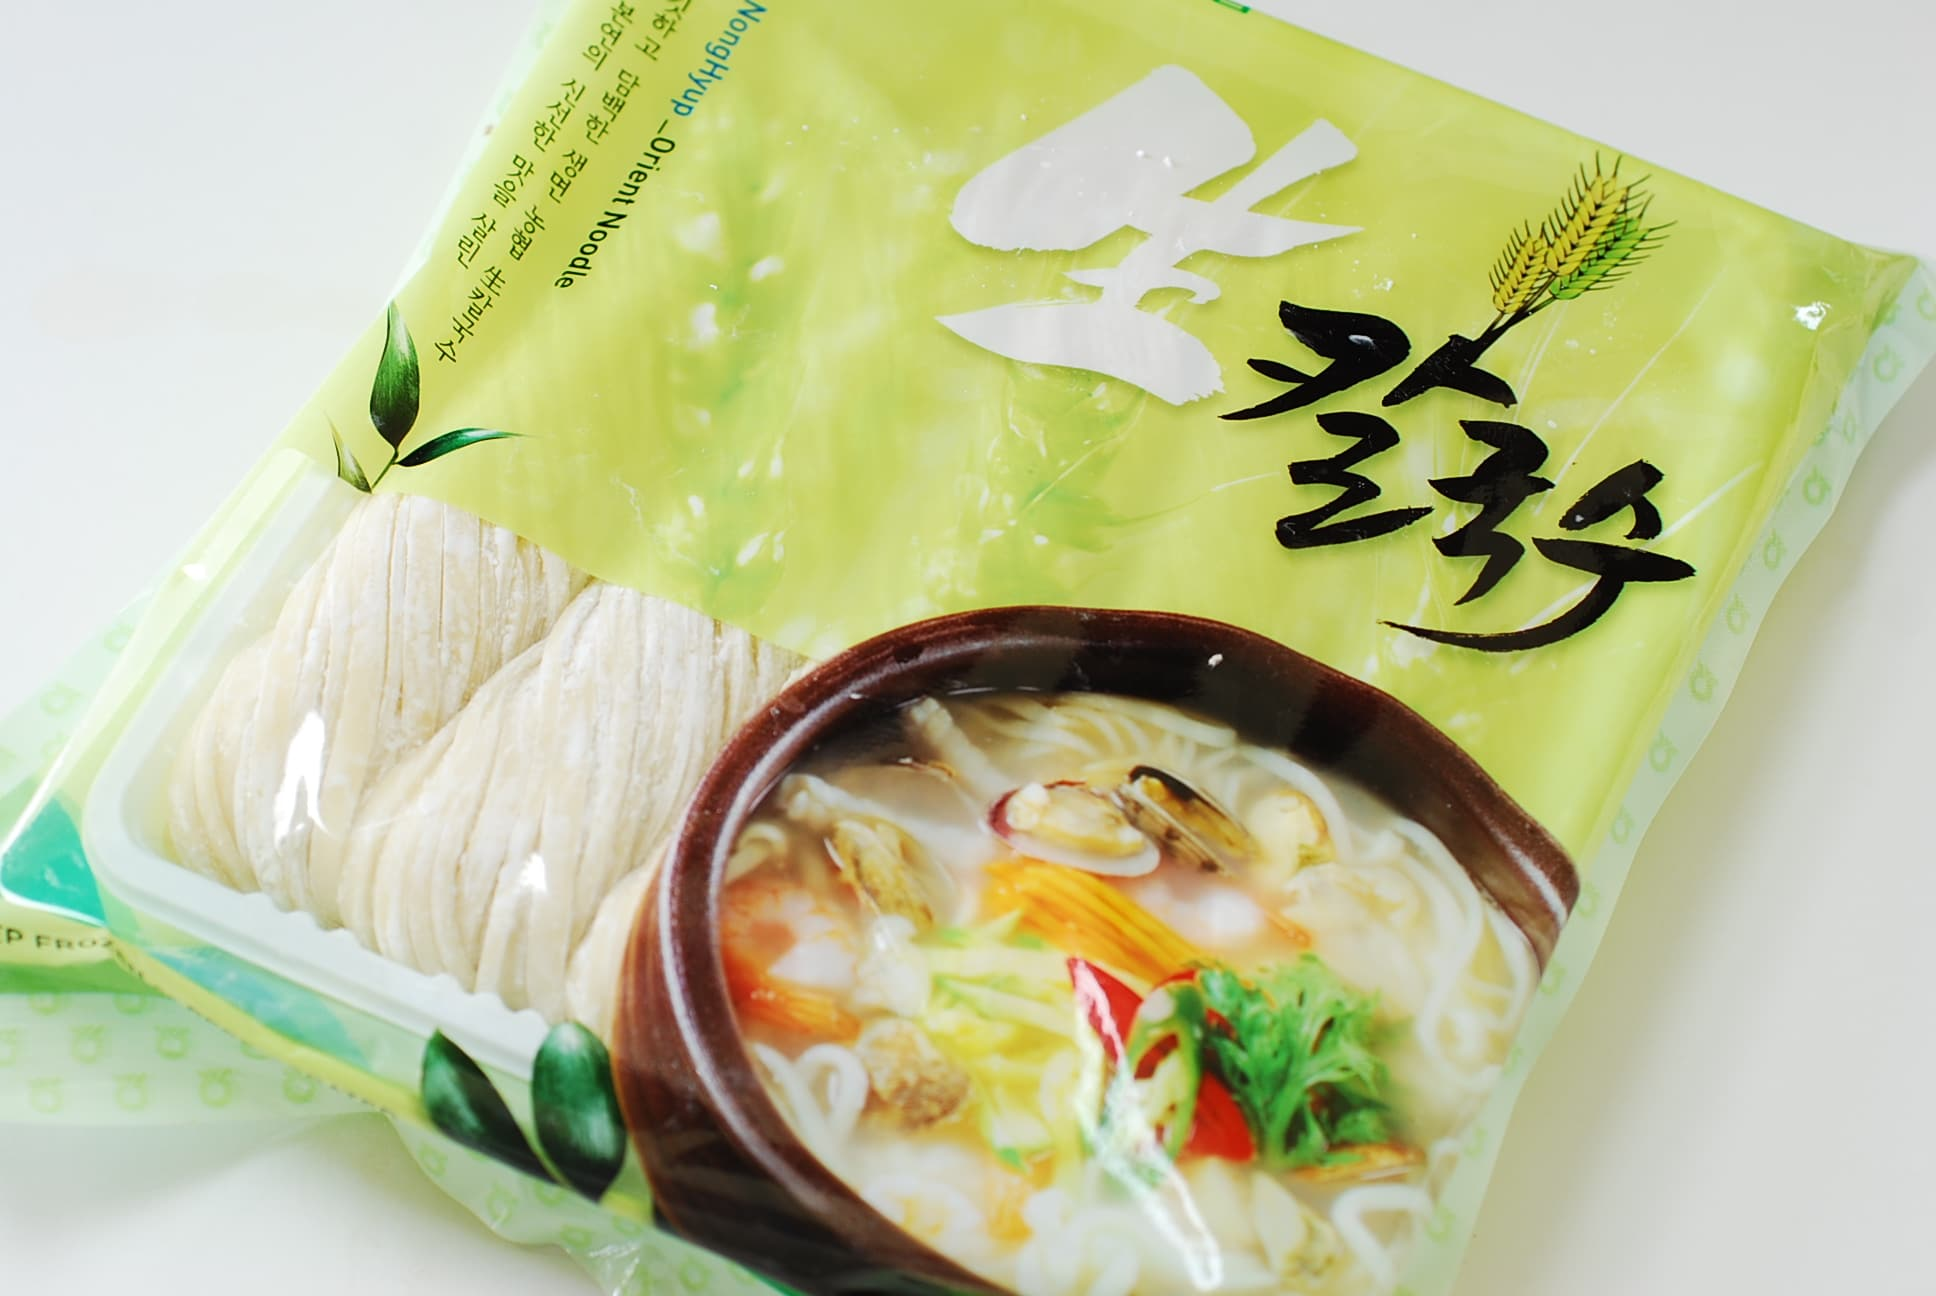 DSC 0874 1 - Dak Kalguksu (Chicken Noodle Soup)